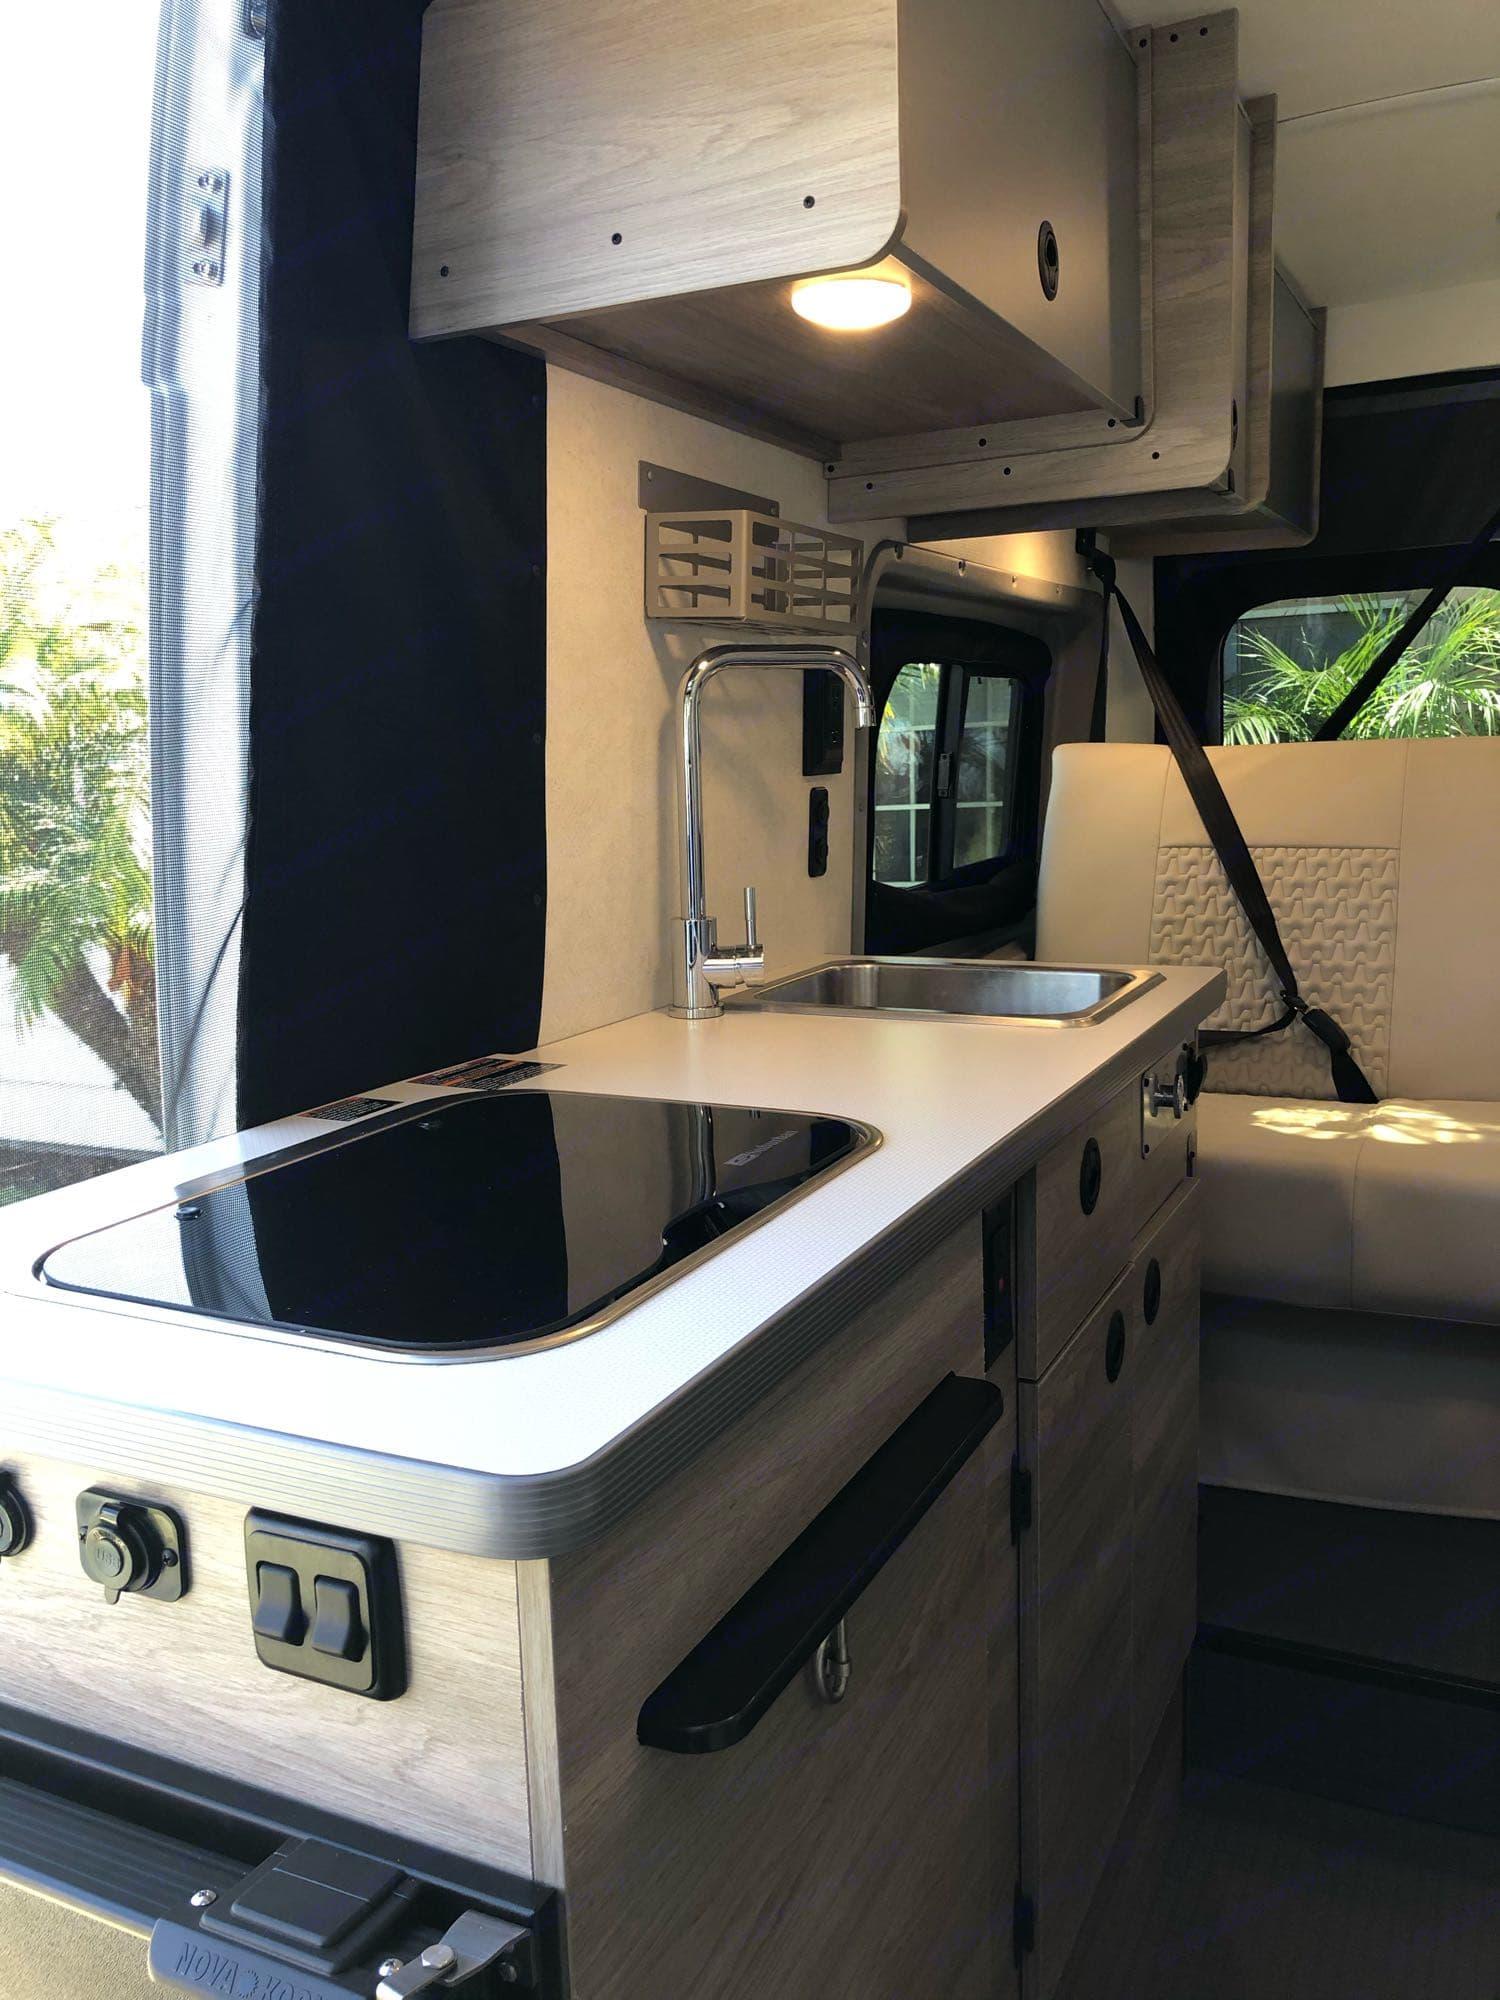 Kitchen Area (2 burner stove, refrigerator, sink, spice rack, cutting board and storage). Winnebago Other 2021